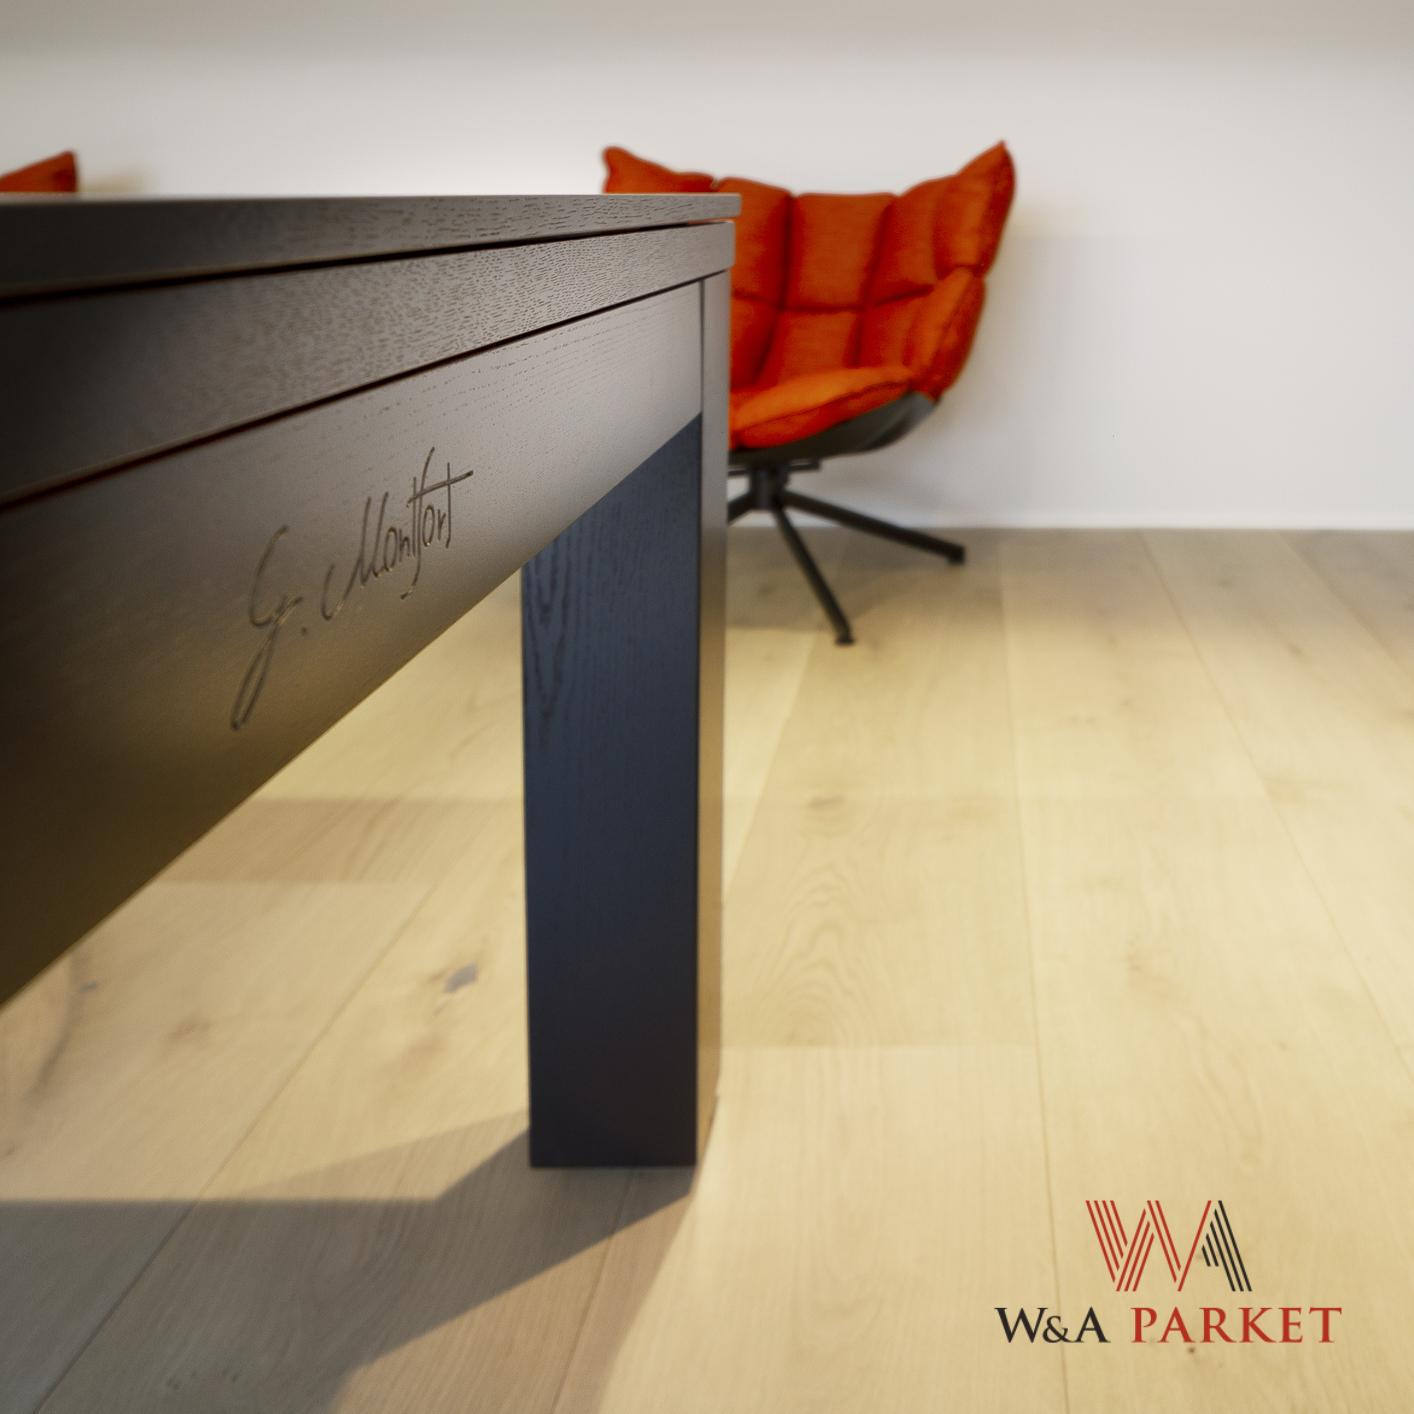 Di legno Nibbia eik rustiek exclusief 30cm